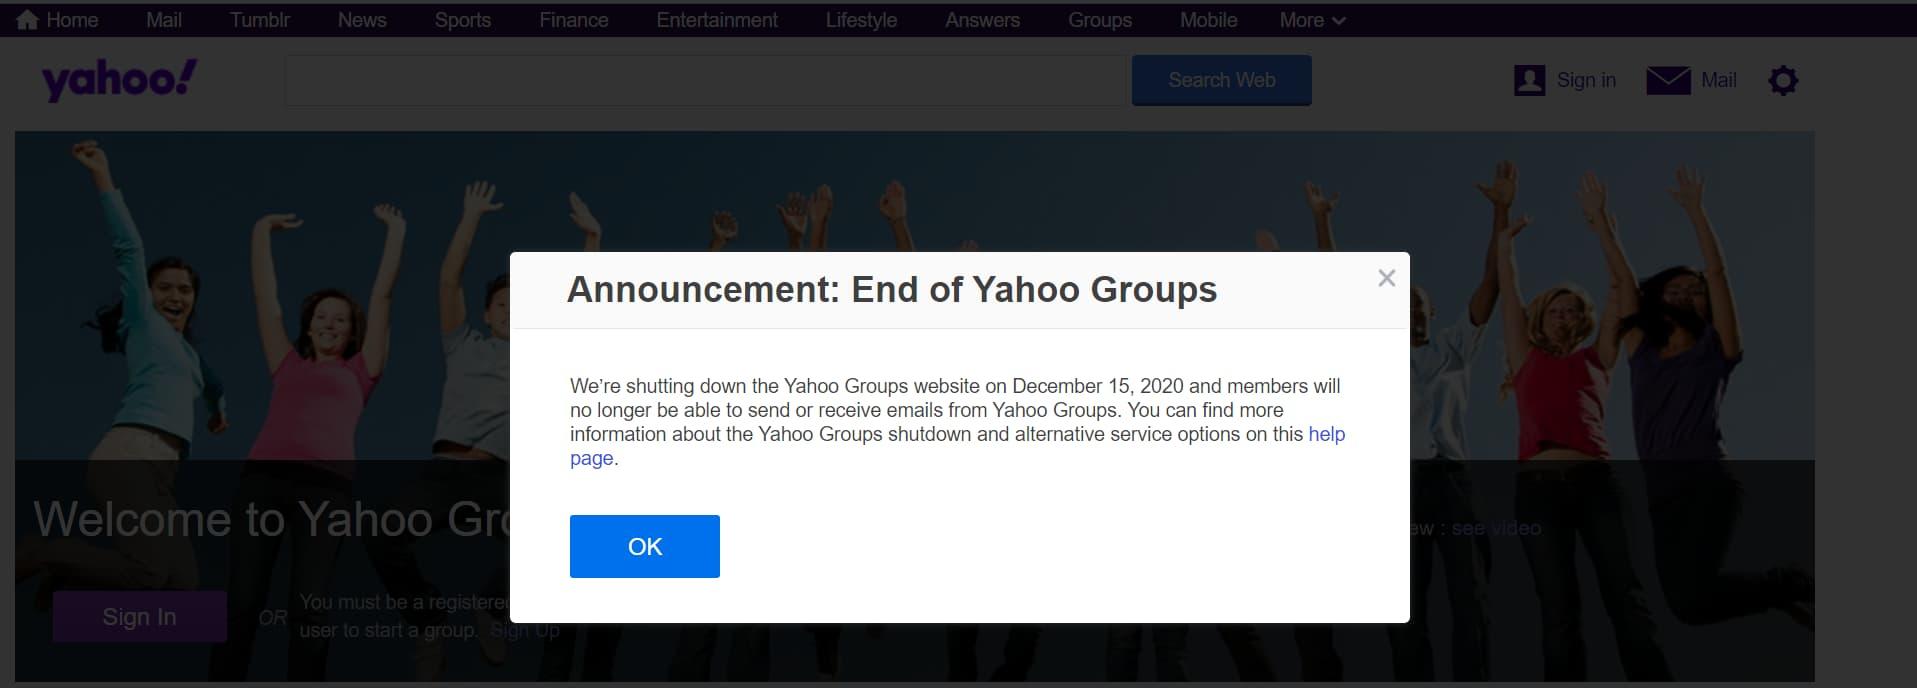 Yahoo Groups To Shutdown On December 15